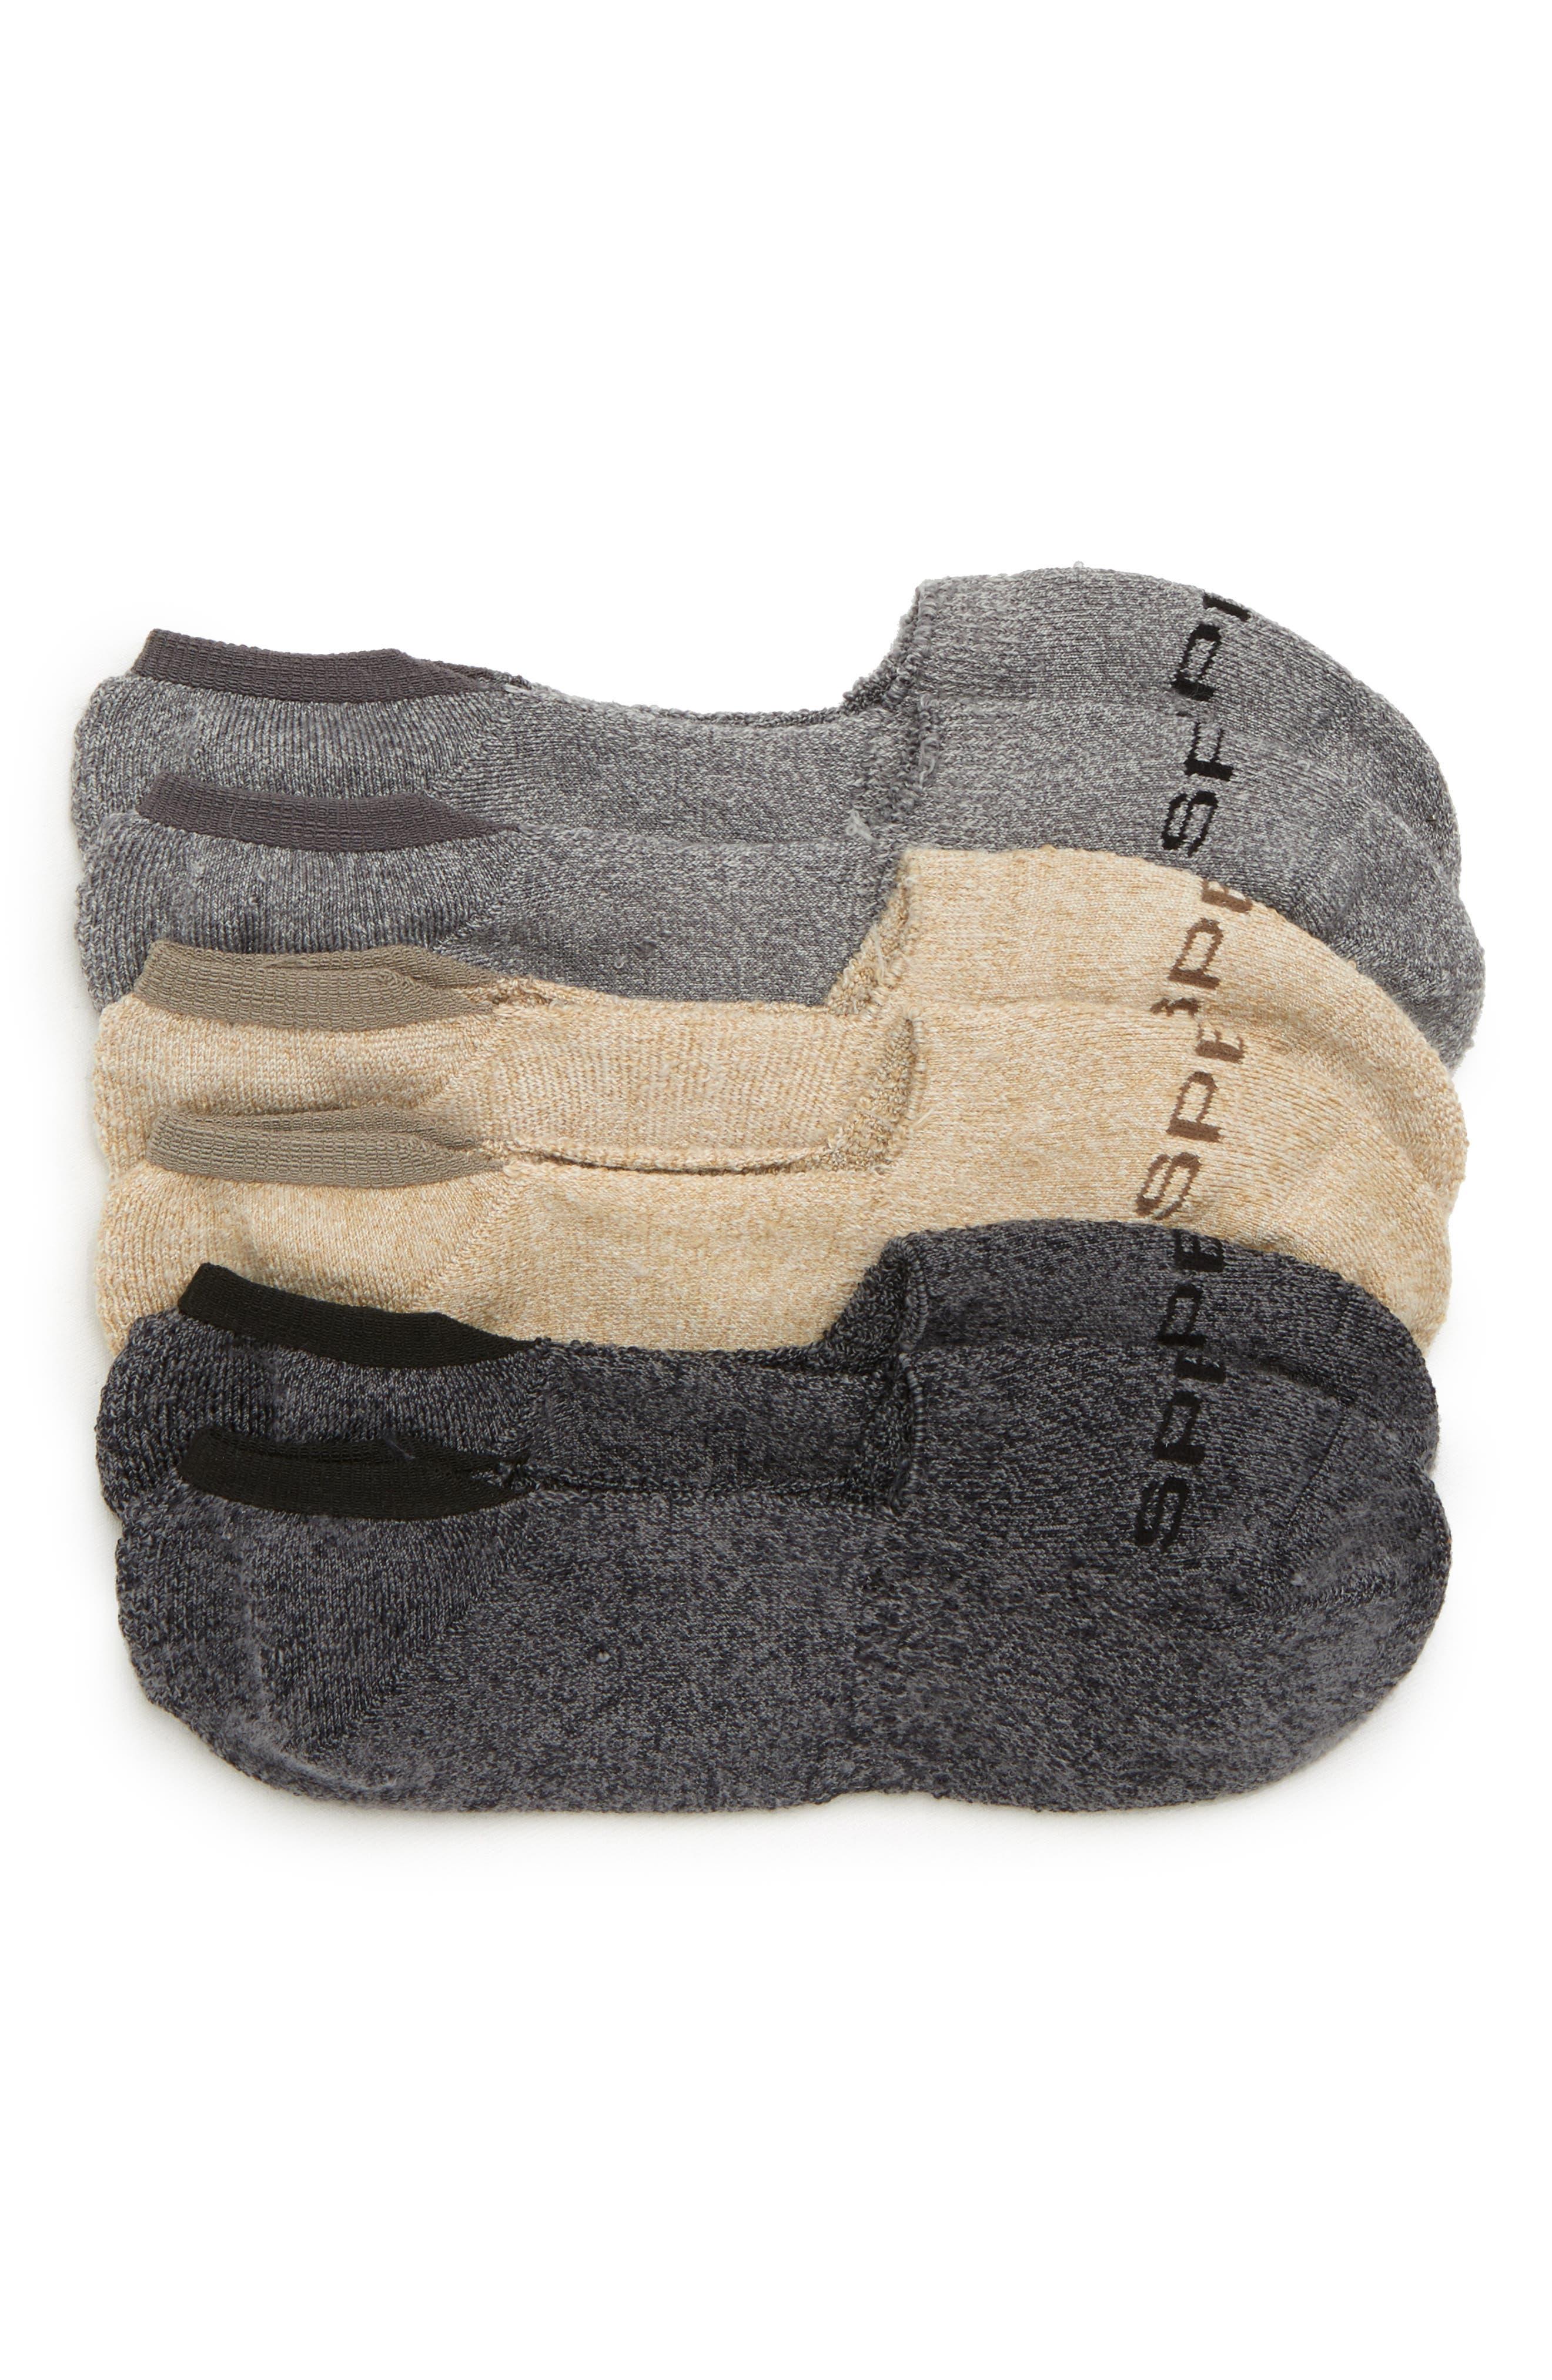 Top-Sider 3-Pack Microfiber Liner Socks,                             Main thumbnail 1, color,                             Grey Marl